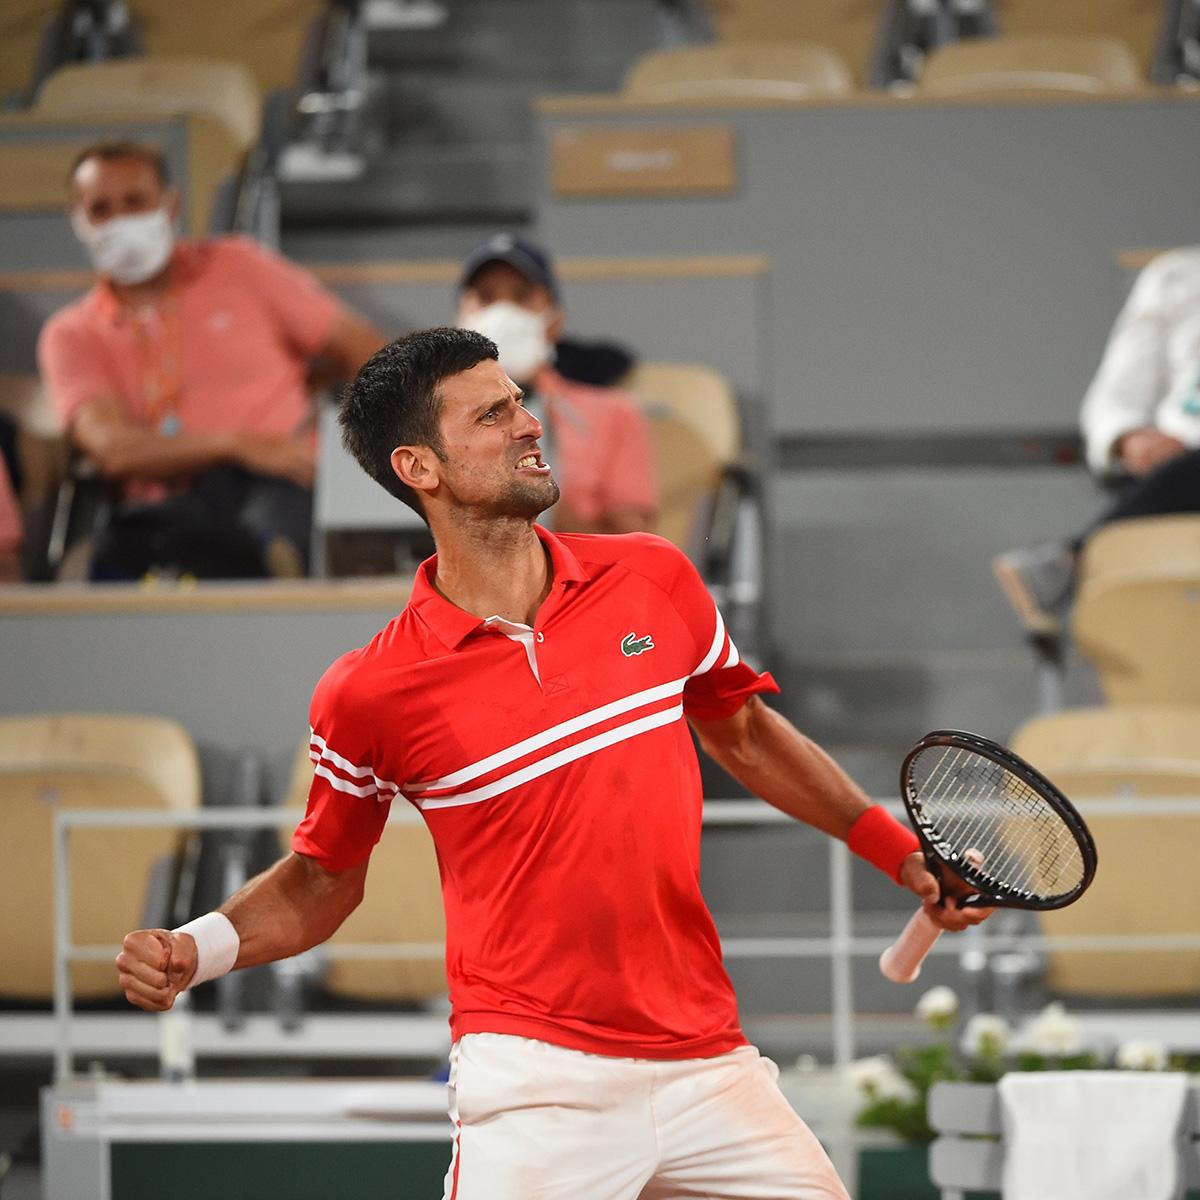 Petenis Nomor 1 Dunia asal Kroasi, Novak Djokovic lolos ke semifinal Grand Slam Prancis Open 2021